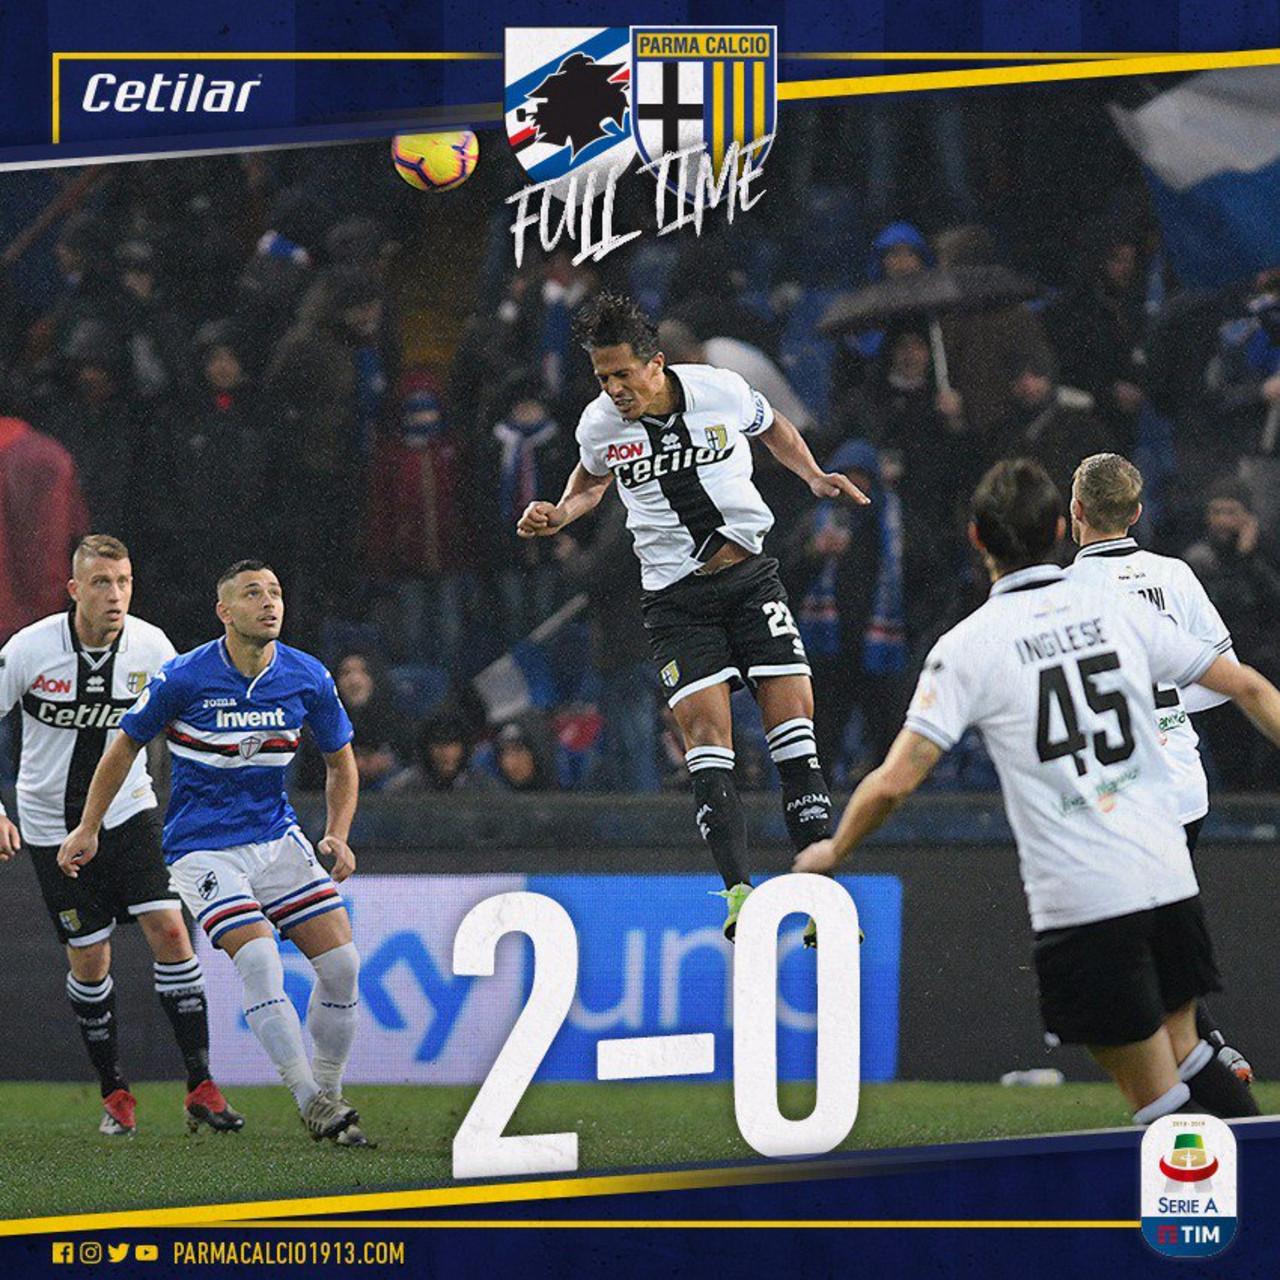 Sampdoria-Parma 2-0: le voci dei protagonisti